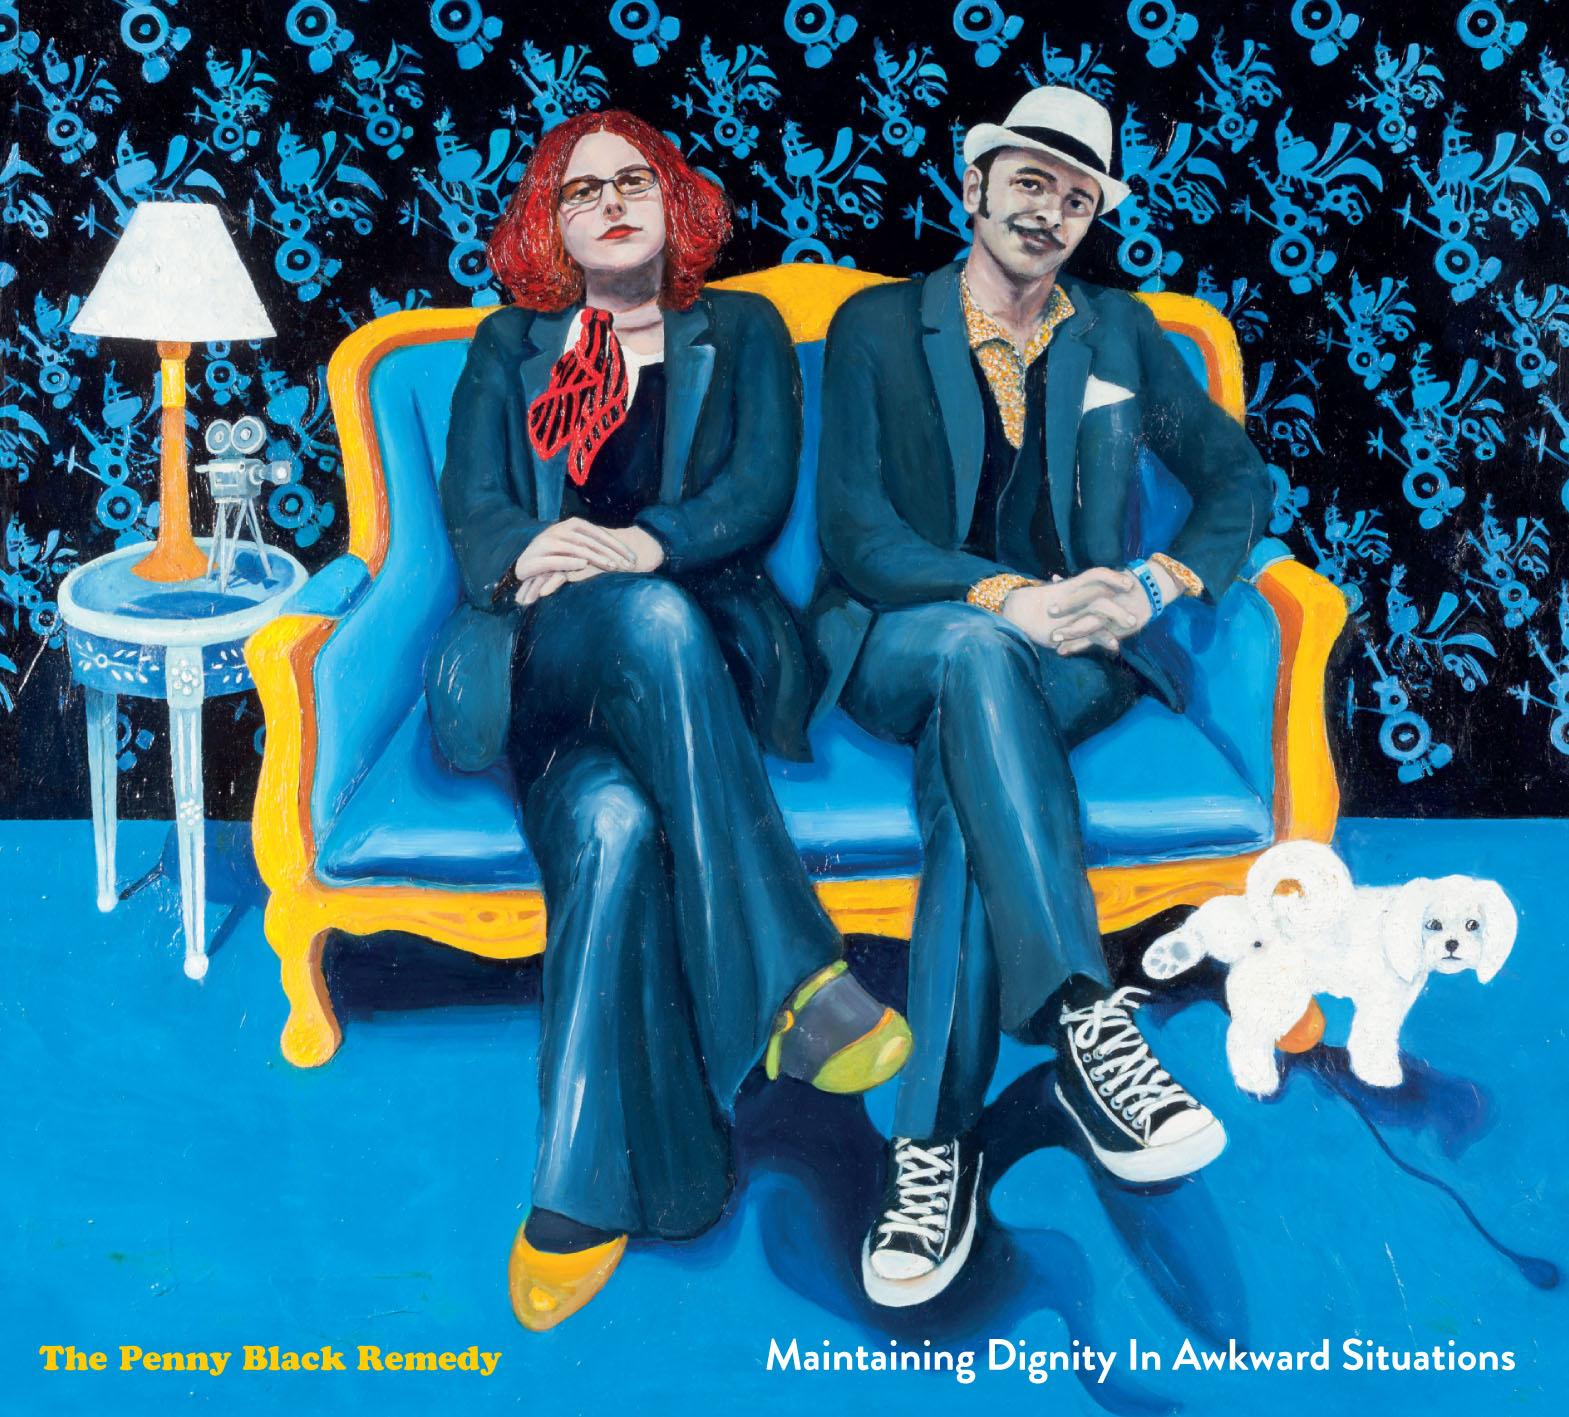 NEW TPBR ALBUM ARTWORK & TITLE REVEALED